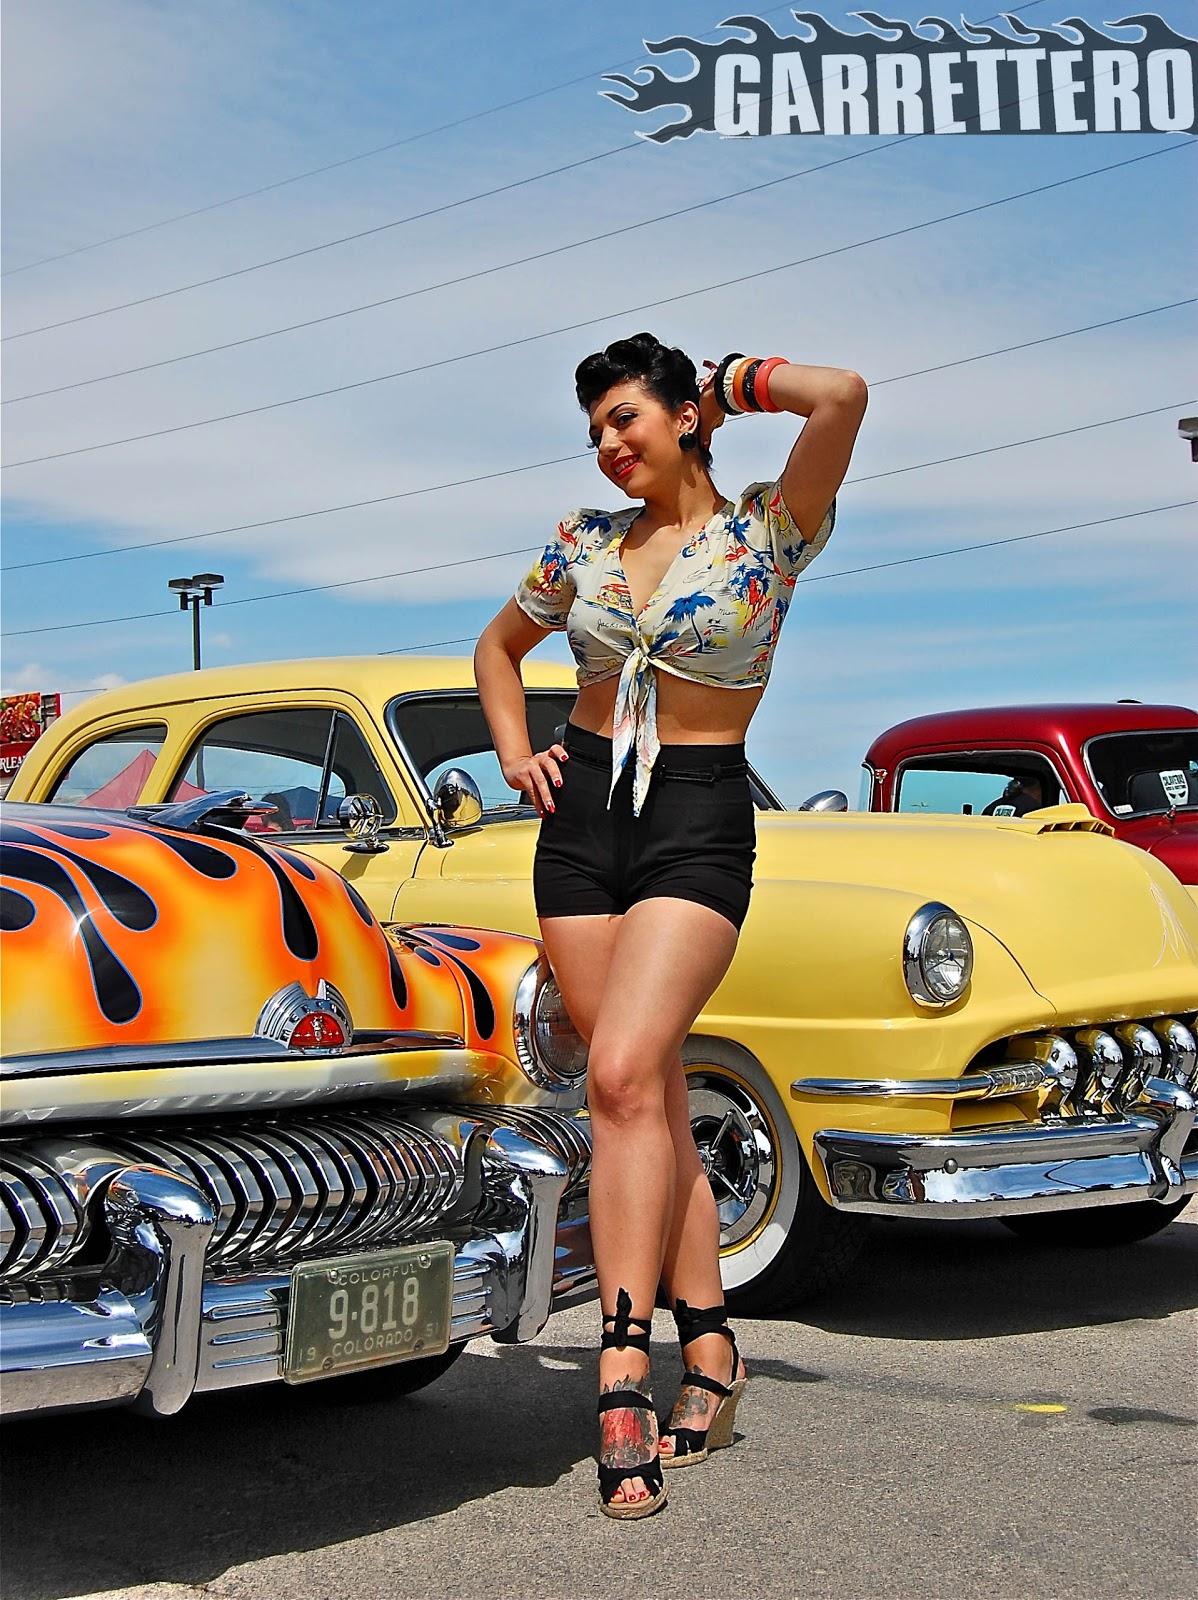 Garrettero Kustom Photography And Art Viva Las Vegas Rockabilly - Vegas rockabilly car show